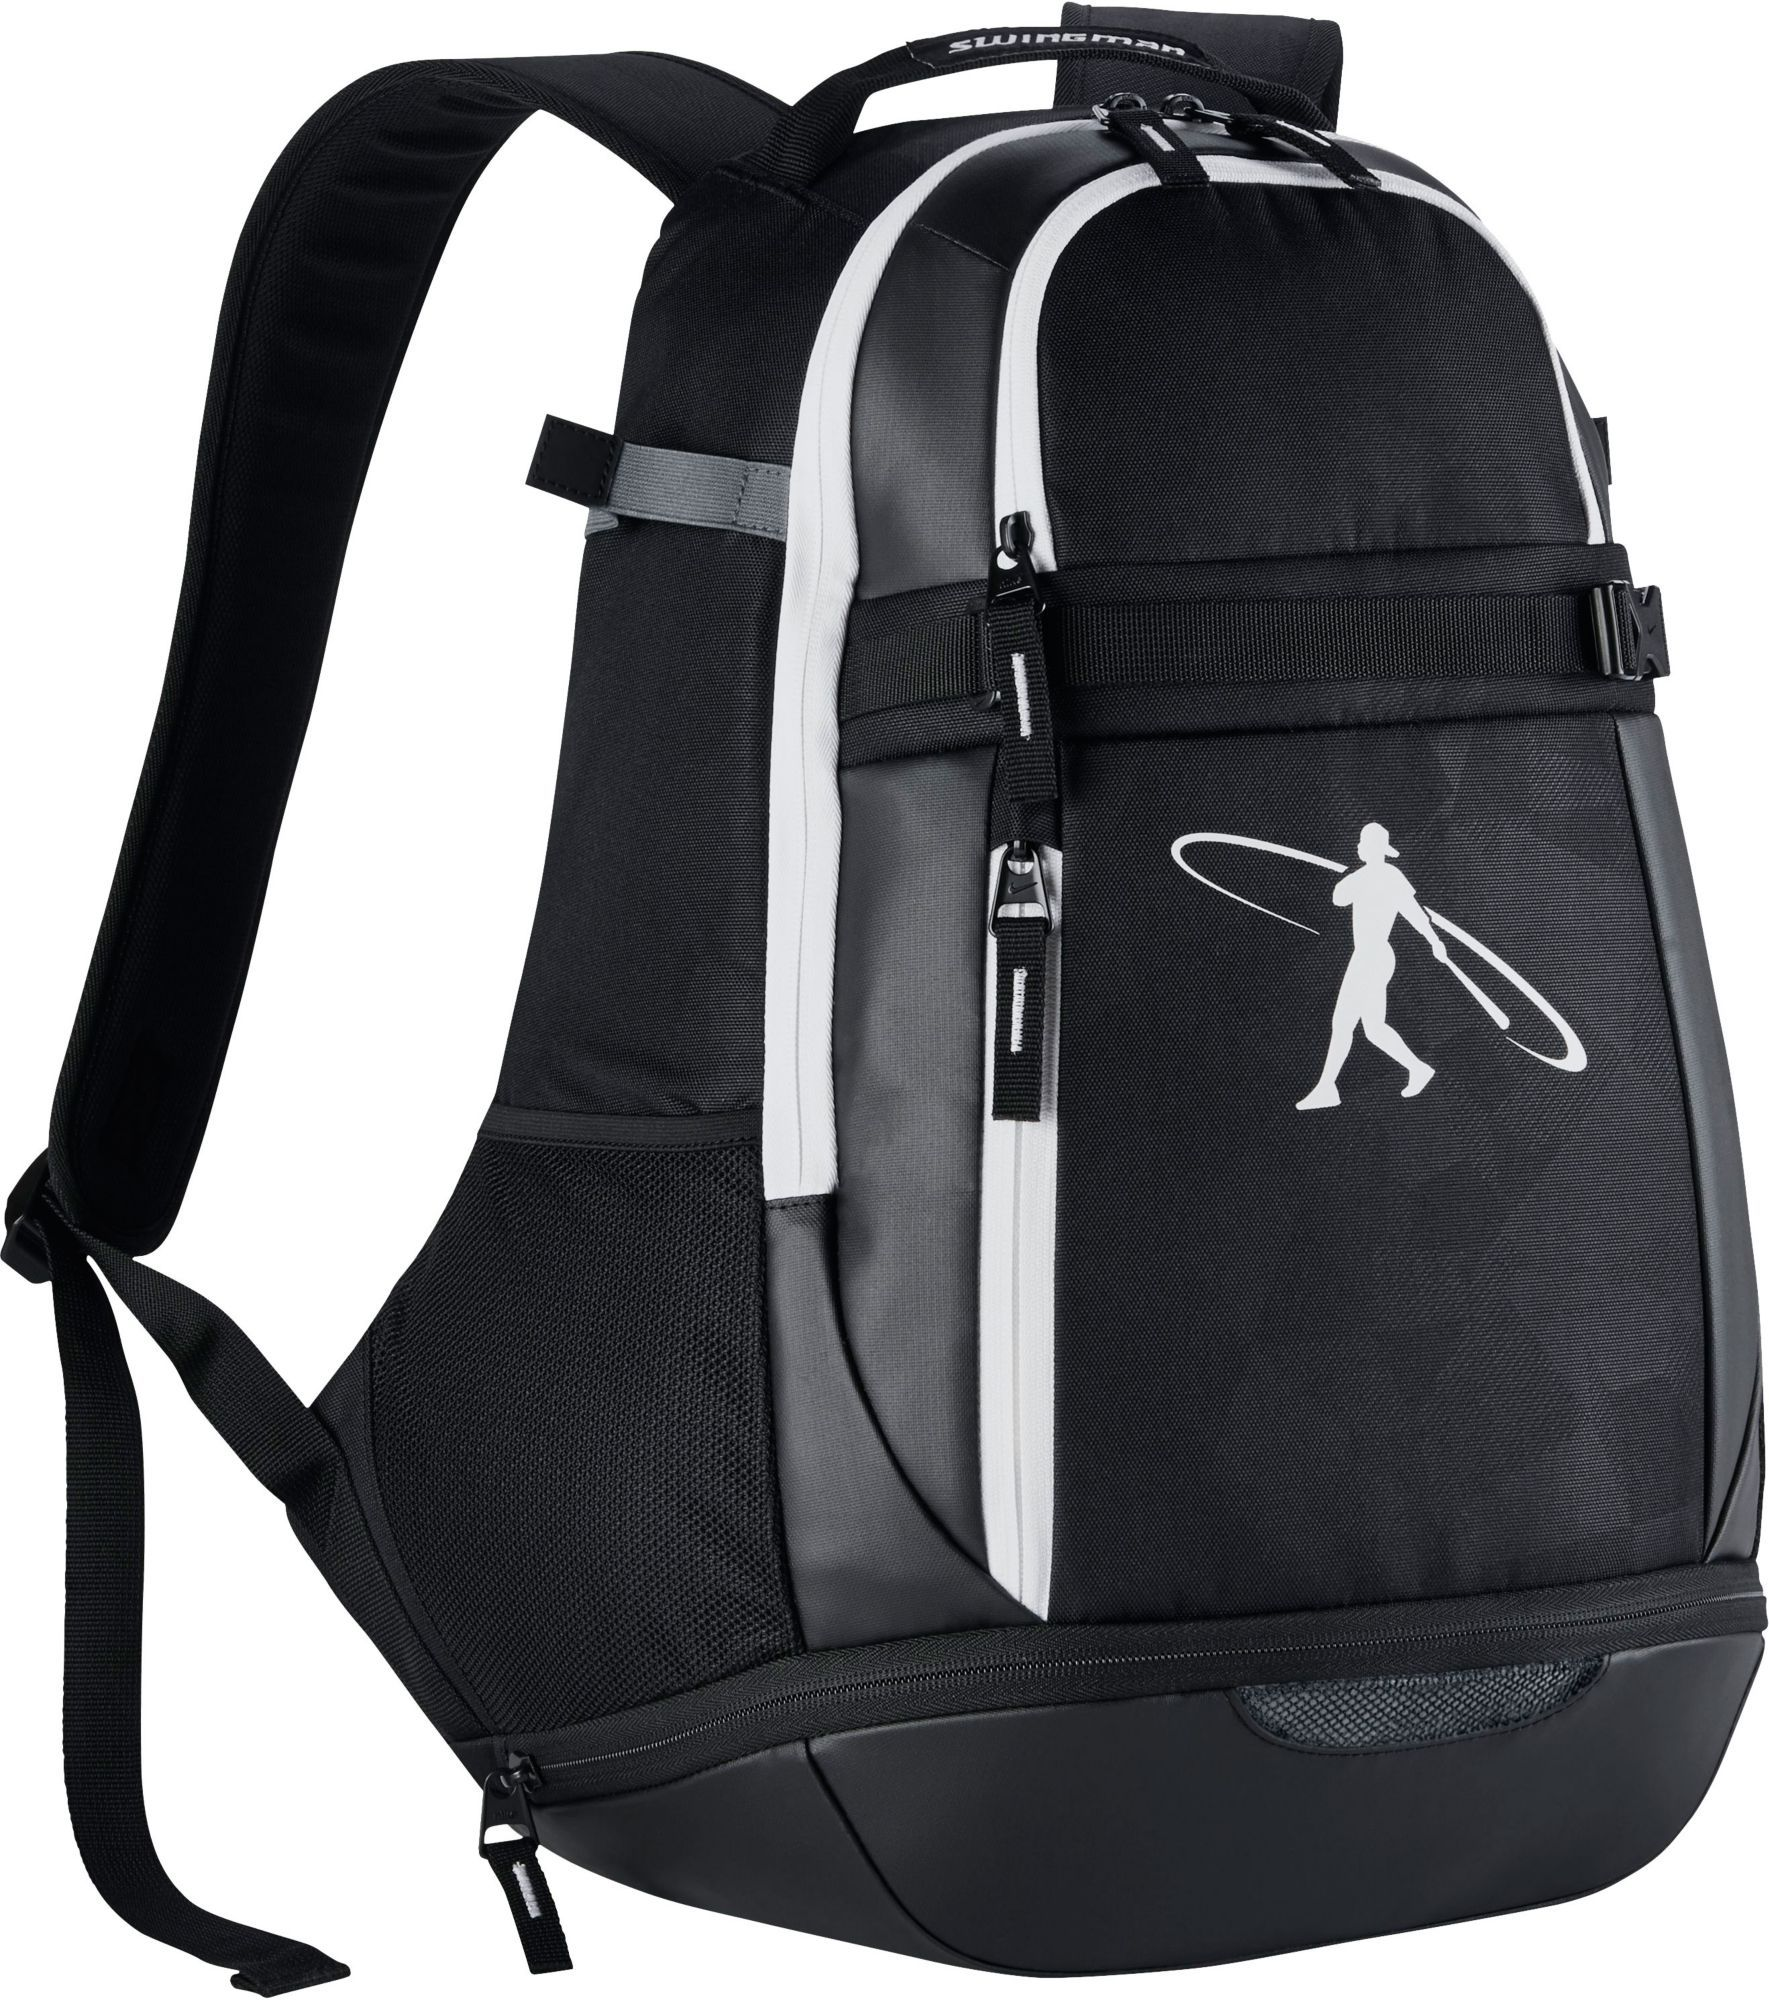 9ba16fa1c Nike Swingman 3.0 Bat Pack | DICK'S Sporting GoodsProposition 65 warning  iconProposition 65 warning icon